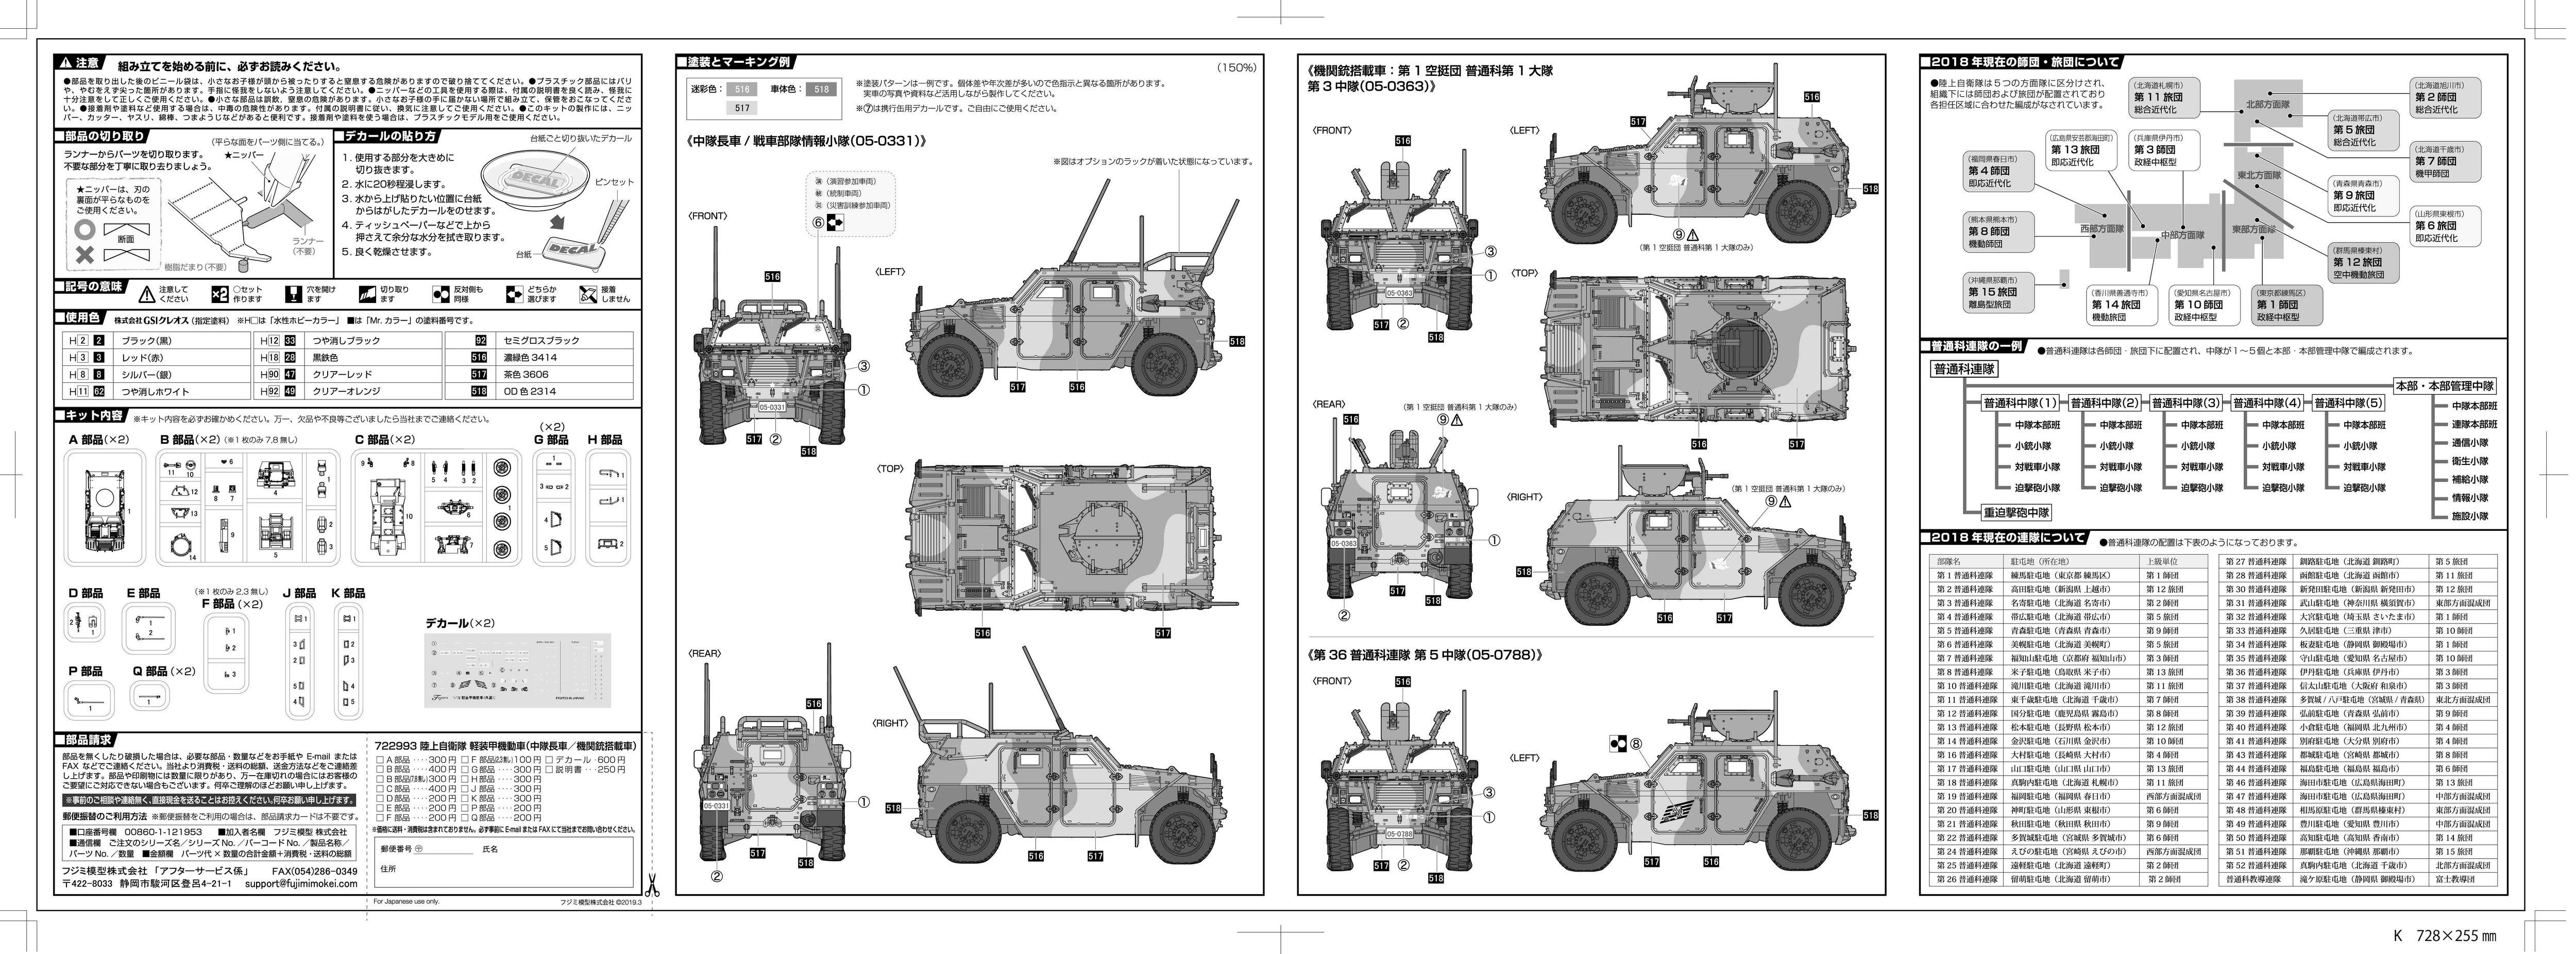 Engine Wiring Diagram Additionally 2011 Yamaha Raptor 125 As Well 1975